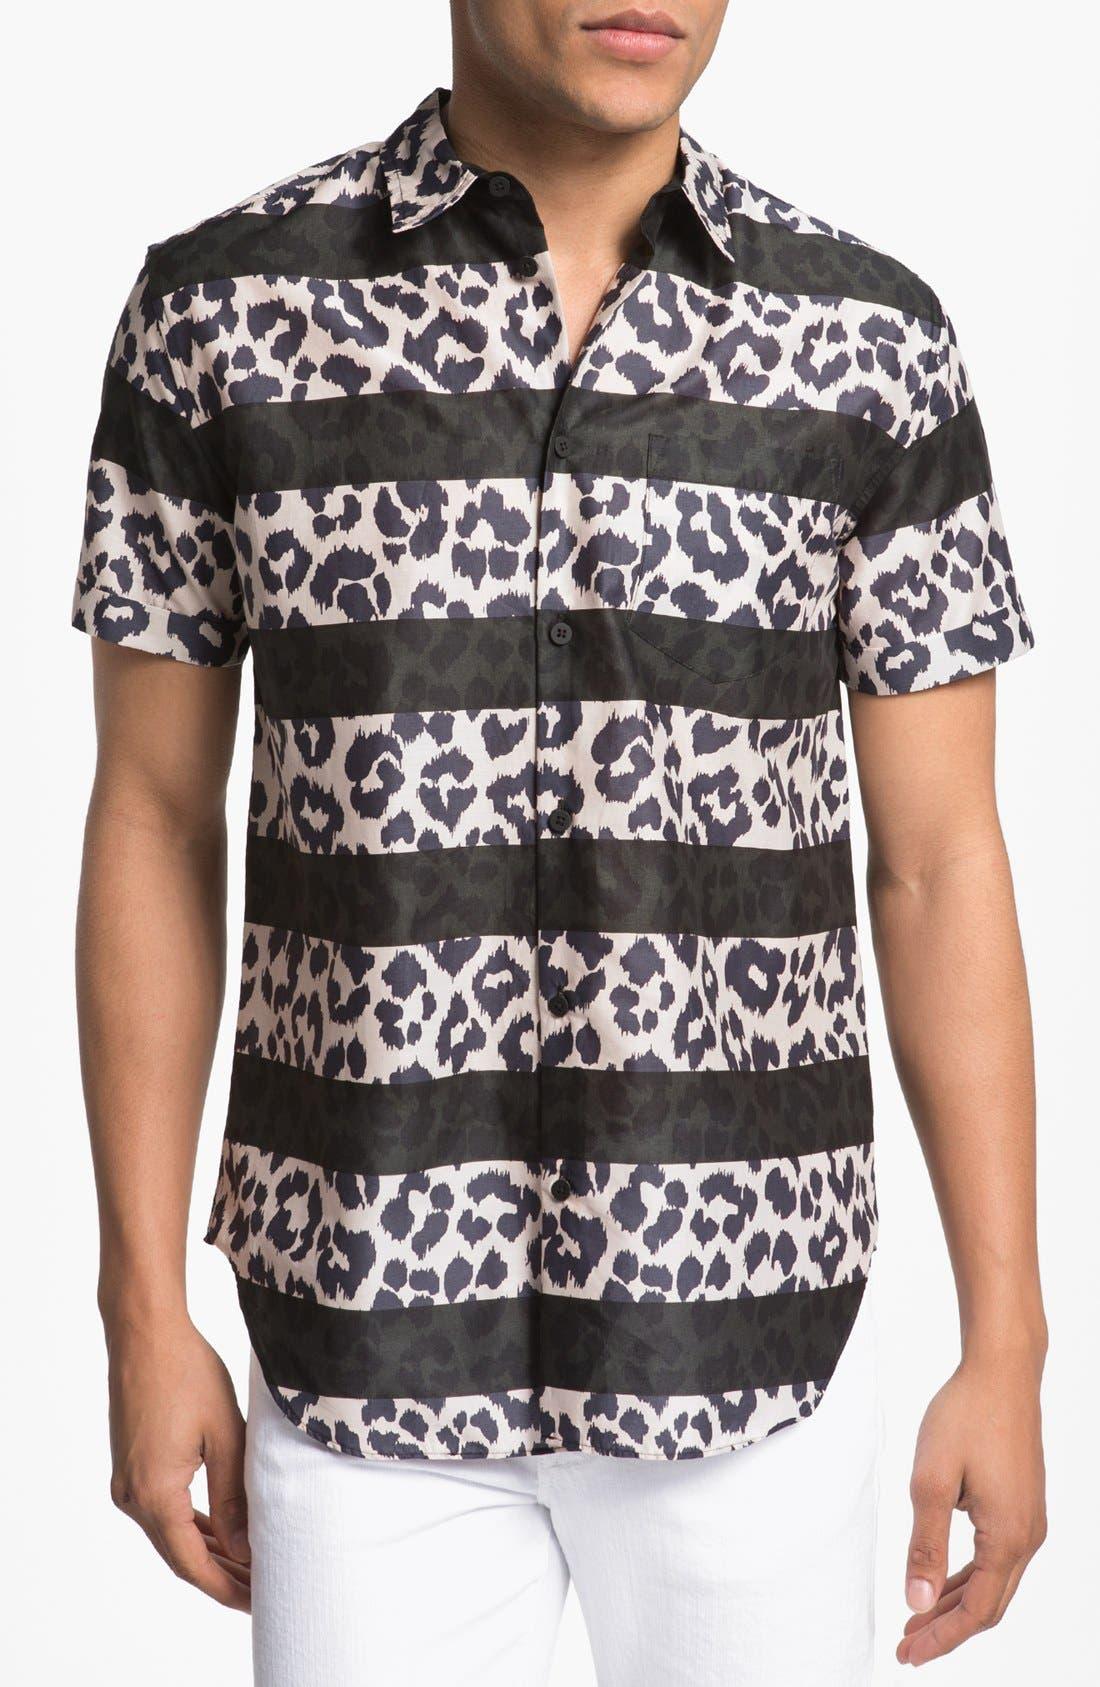 Main Image - MARC BY MARC JACOBS Stripe Cheetah Print Woven Shirt